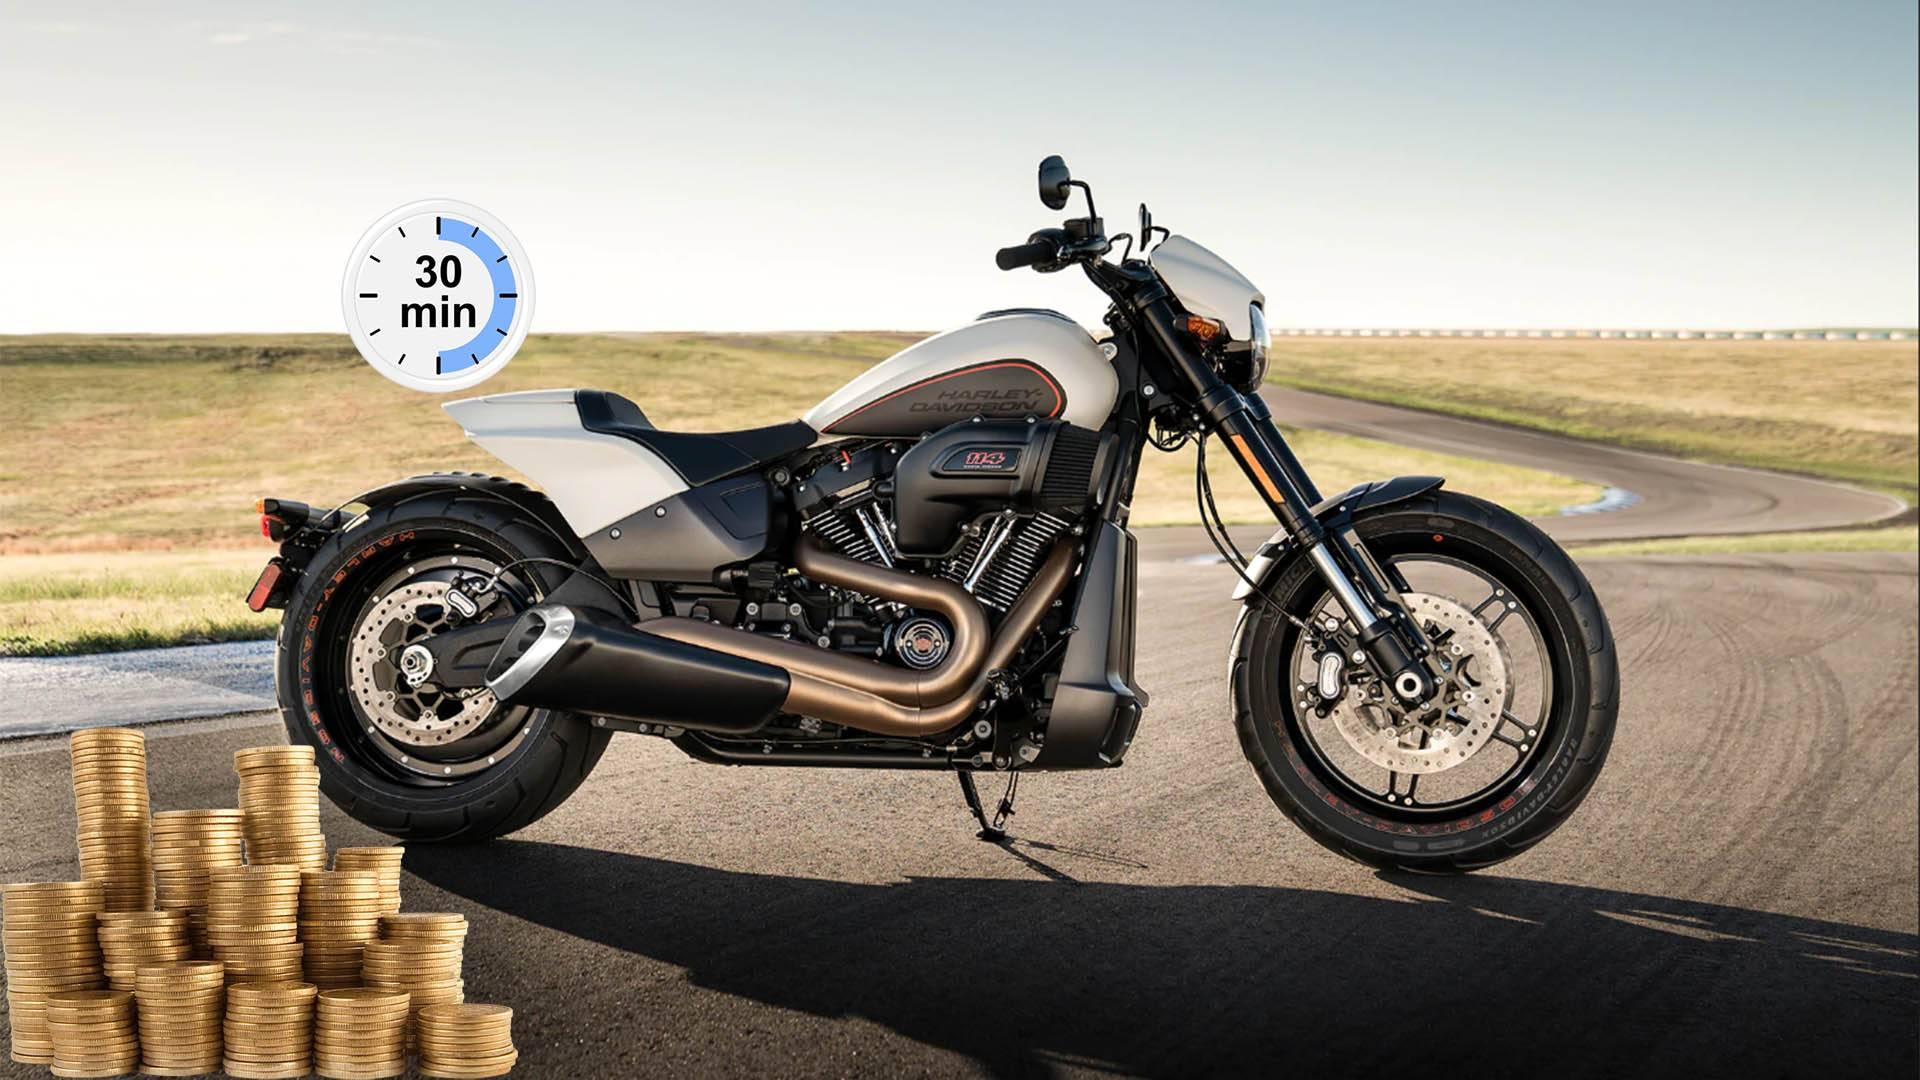 Займ под залог ПТС мотоцикла в Истре